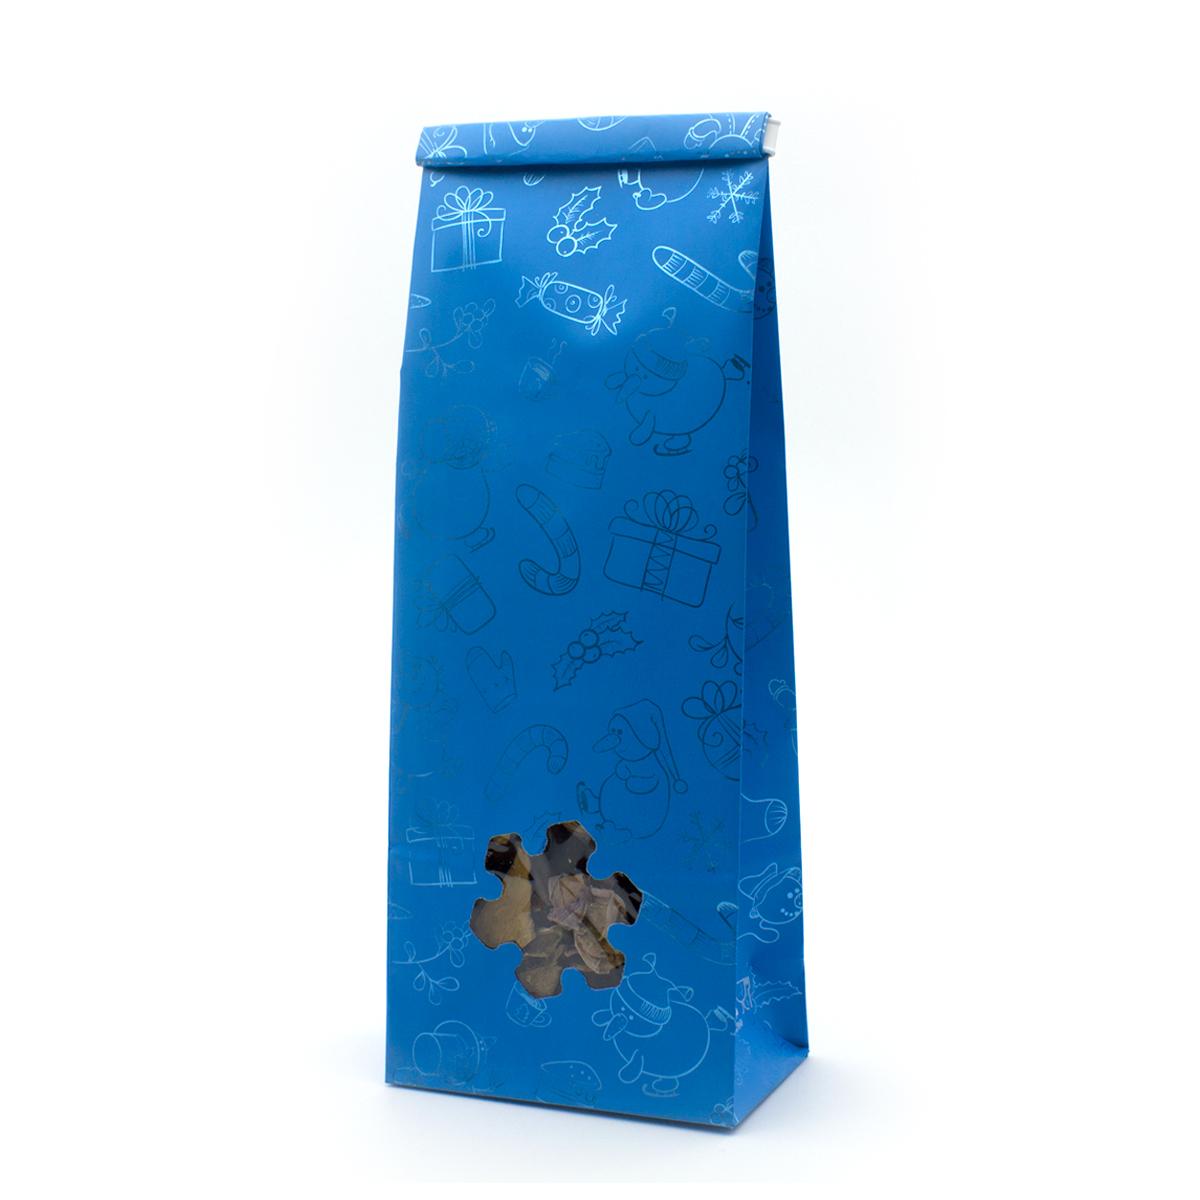 Пакет для чая 250 гр Новогодний сюрприз (22,5 х 8 см) сейф оружейный меткон ошн 8 черный 147 х 45 х 25 см